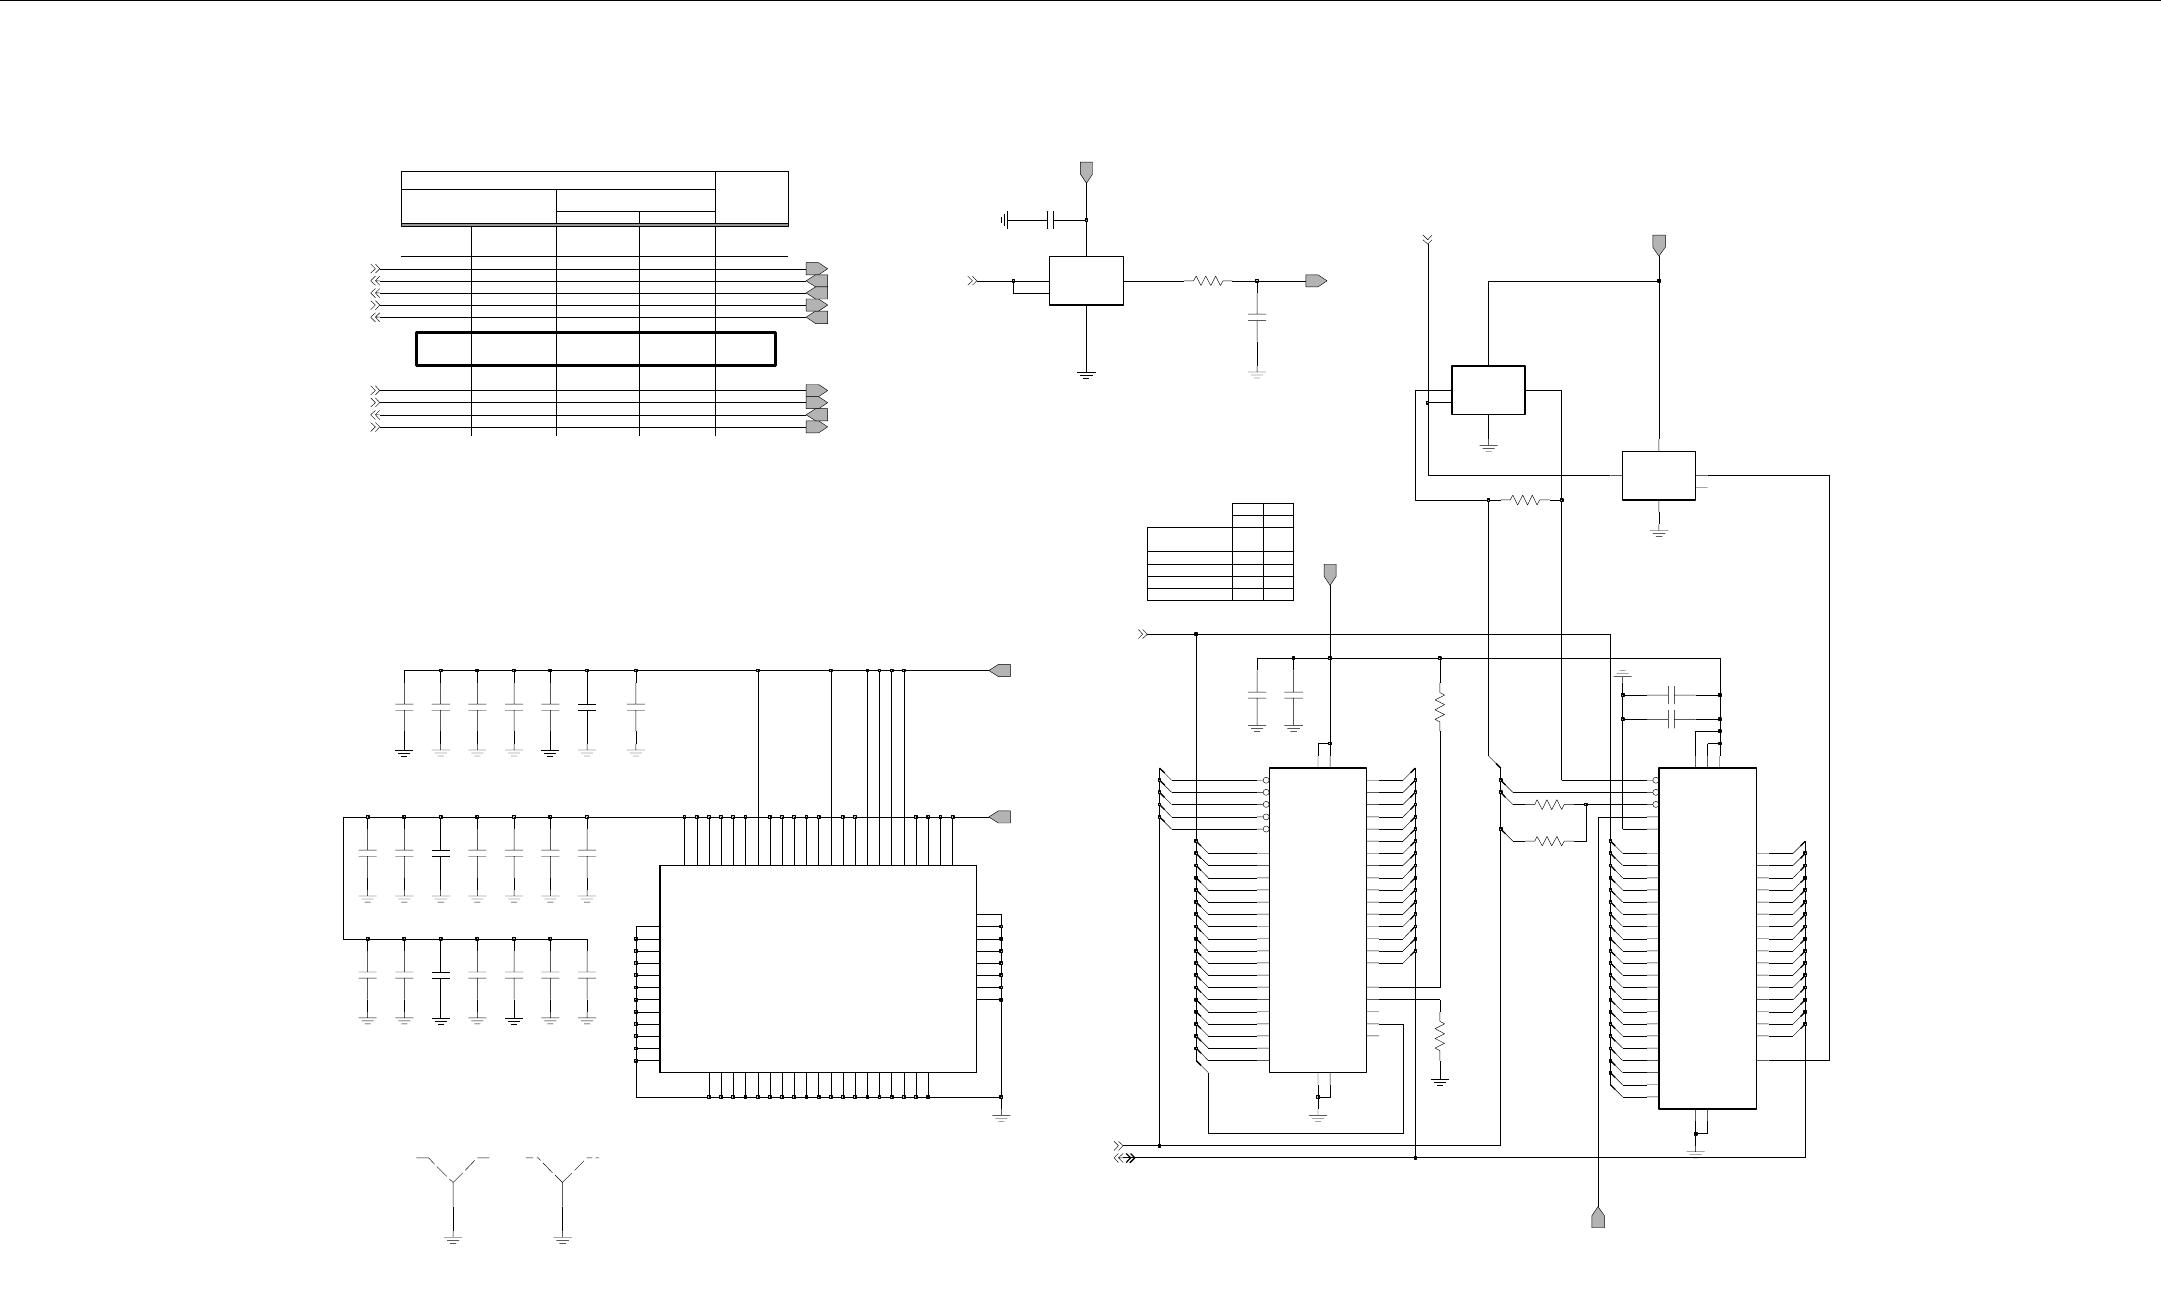 E Tec 1 6l L91 Wiring Diagram Mtp700 Detailed Service Manual 6866534d39 Transceiver 400 Mhz Portable Radio 41 35